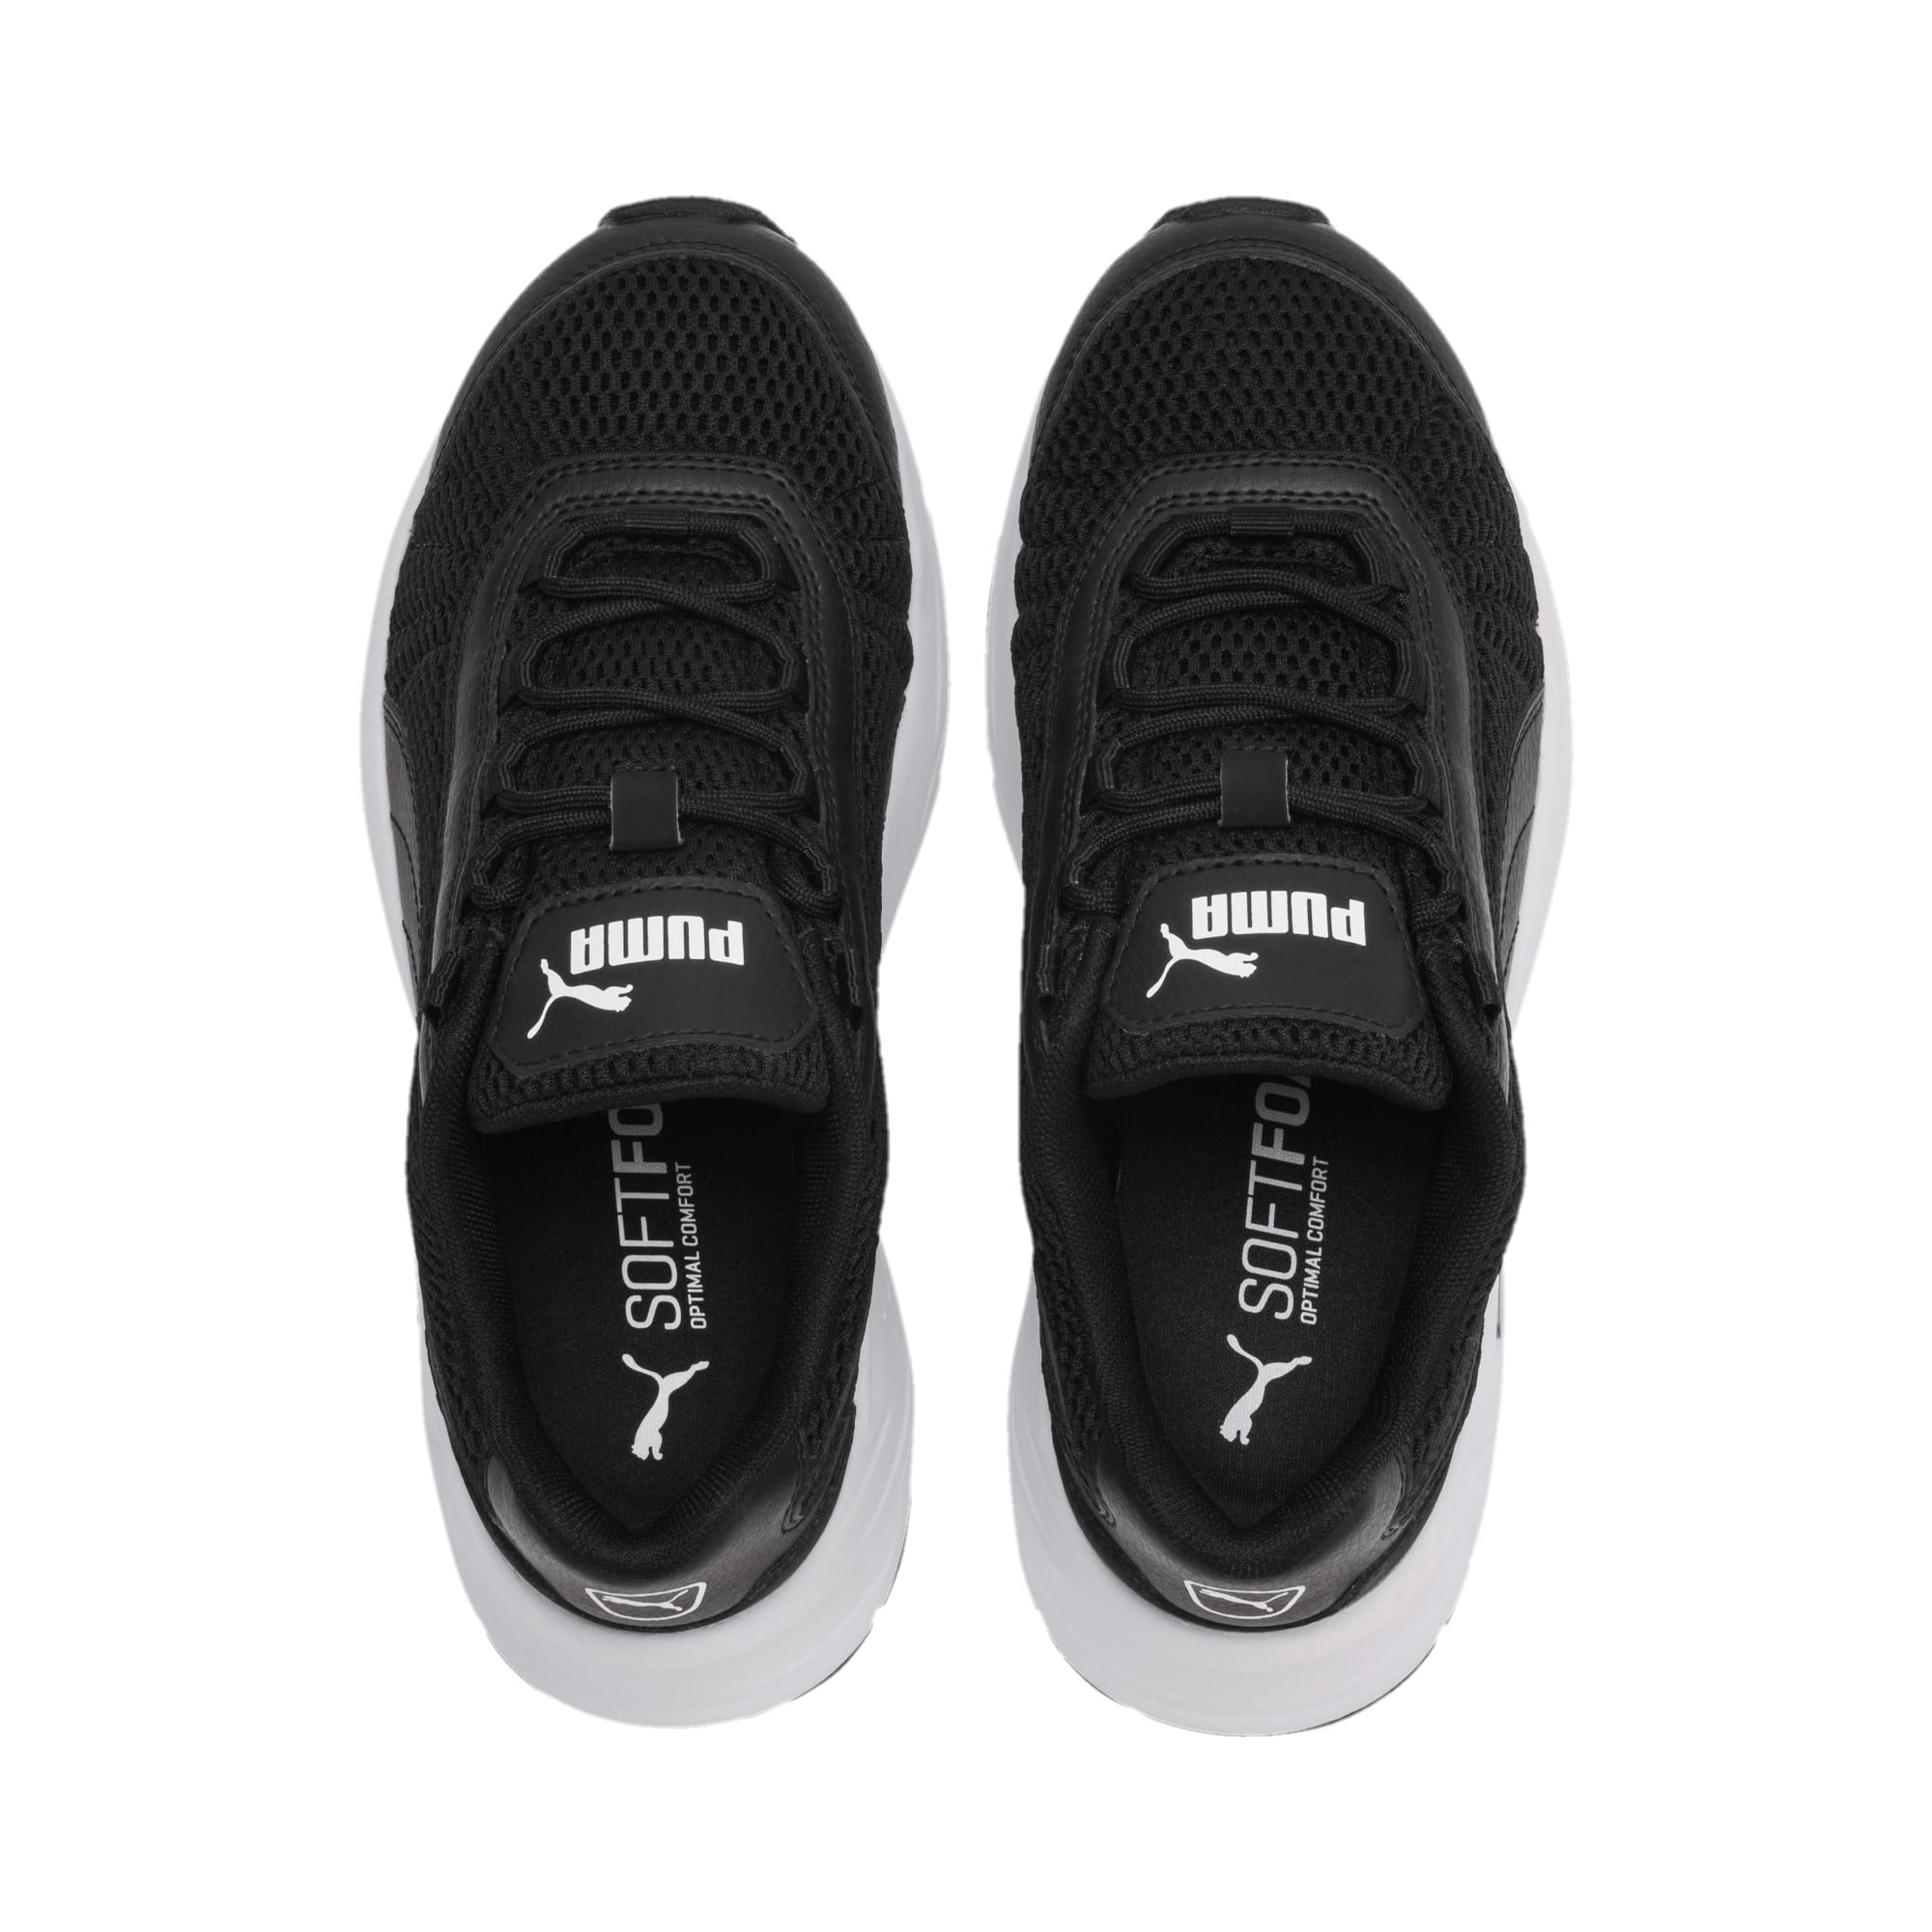 Thumbnail 6 of Nucleus Youth Sneaker, Puma Black-Puma Black, medium